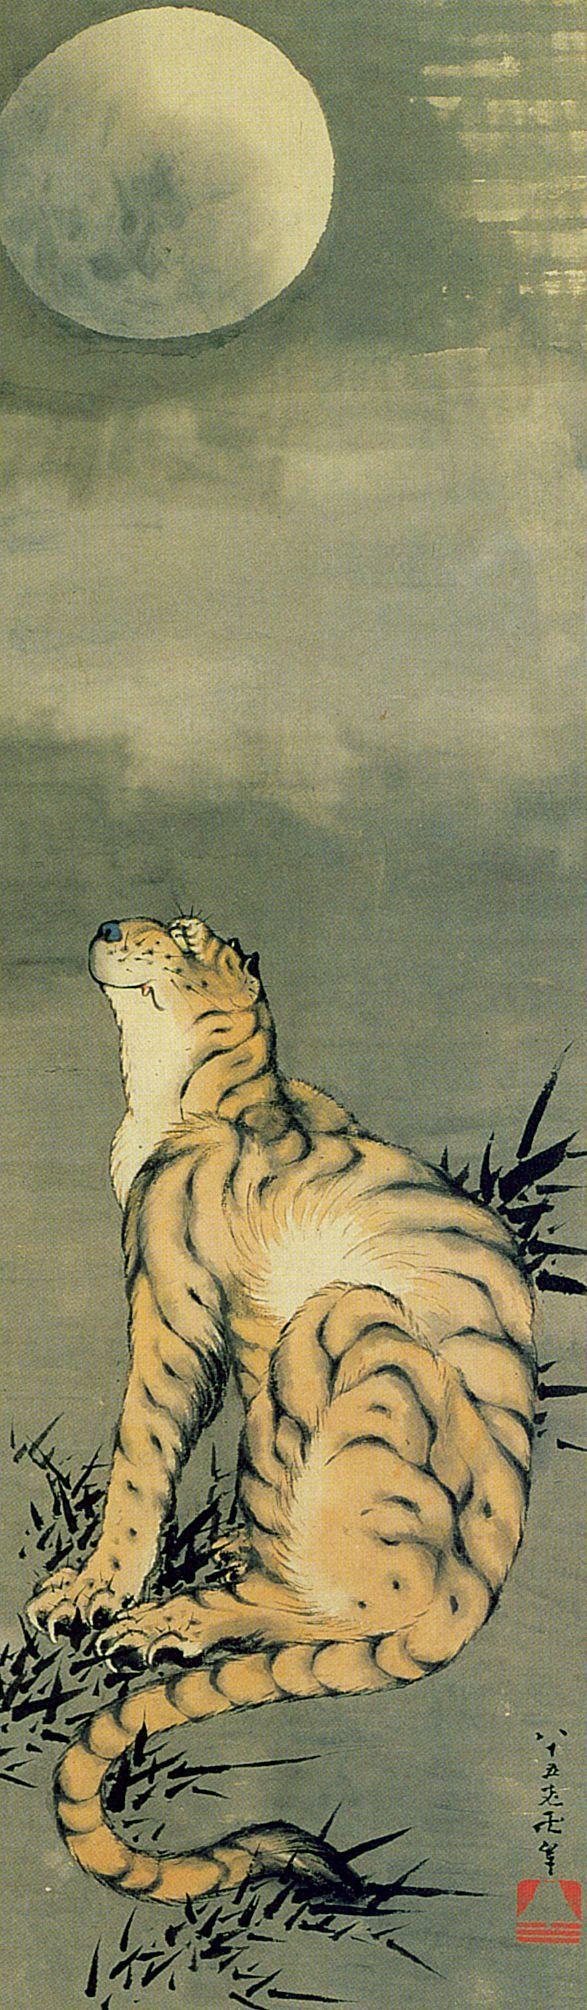 Tiger and moon by Manji 卍 (Hokusai) at the age of 85: Hokusai 北斎, Hokusai 葛飾北斎, Japan Paintings, Japan Art, Woodblock Prints, Art Asian, Hokusai Katsushika, Katsushika Hokusai, Hokusai Art